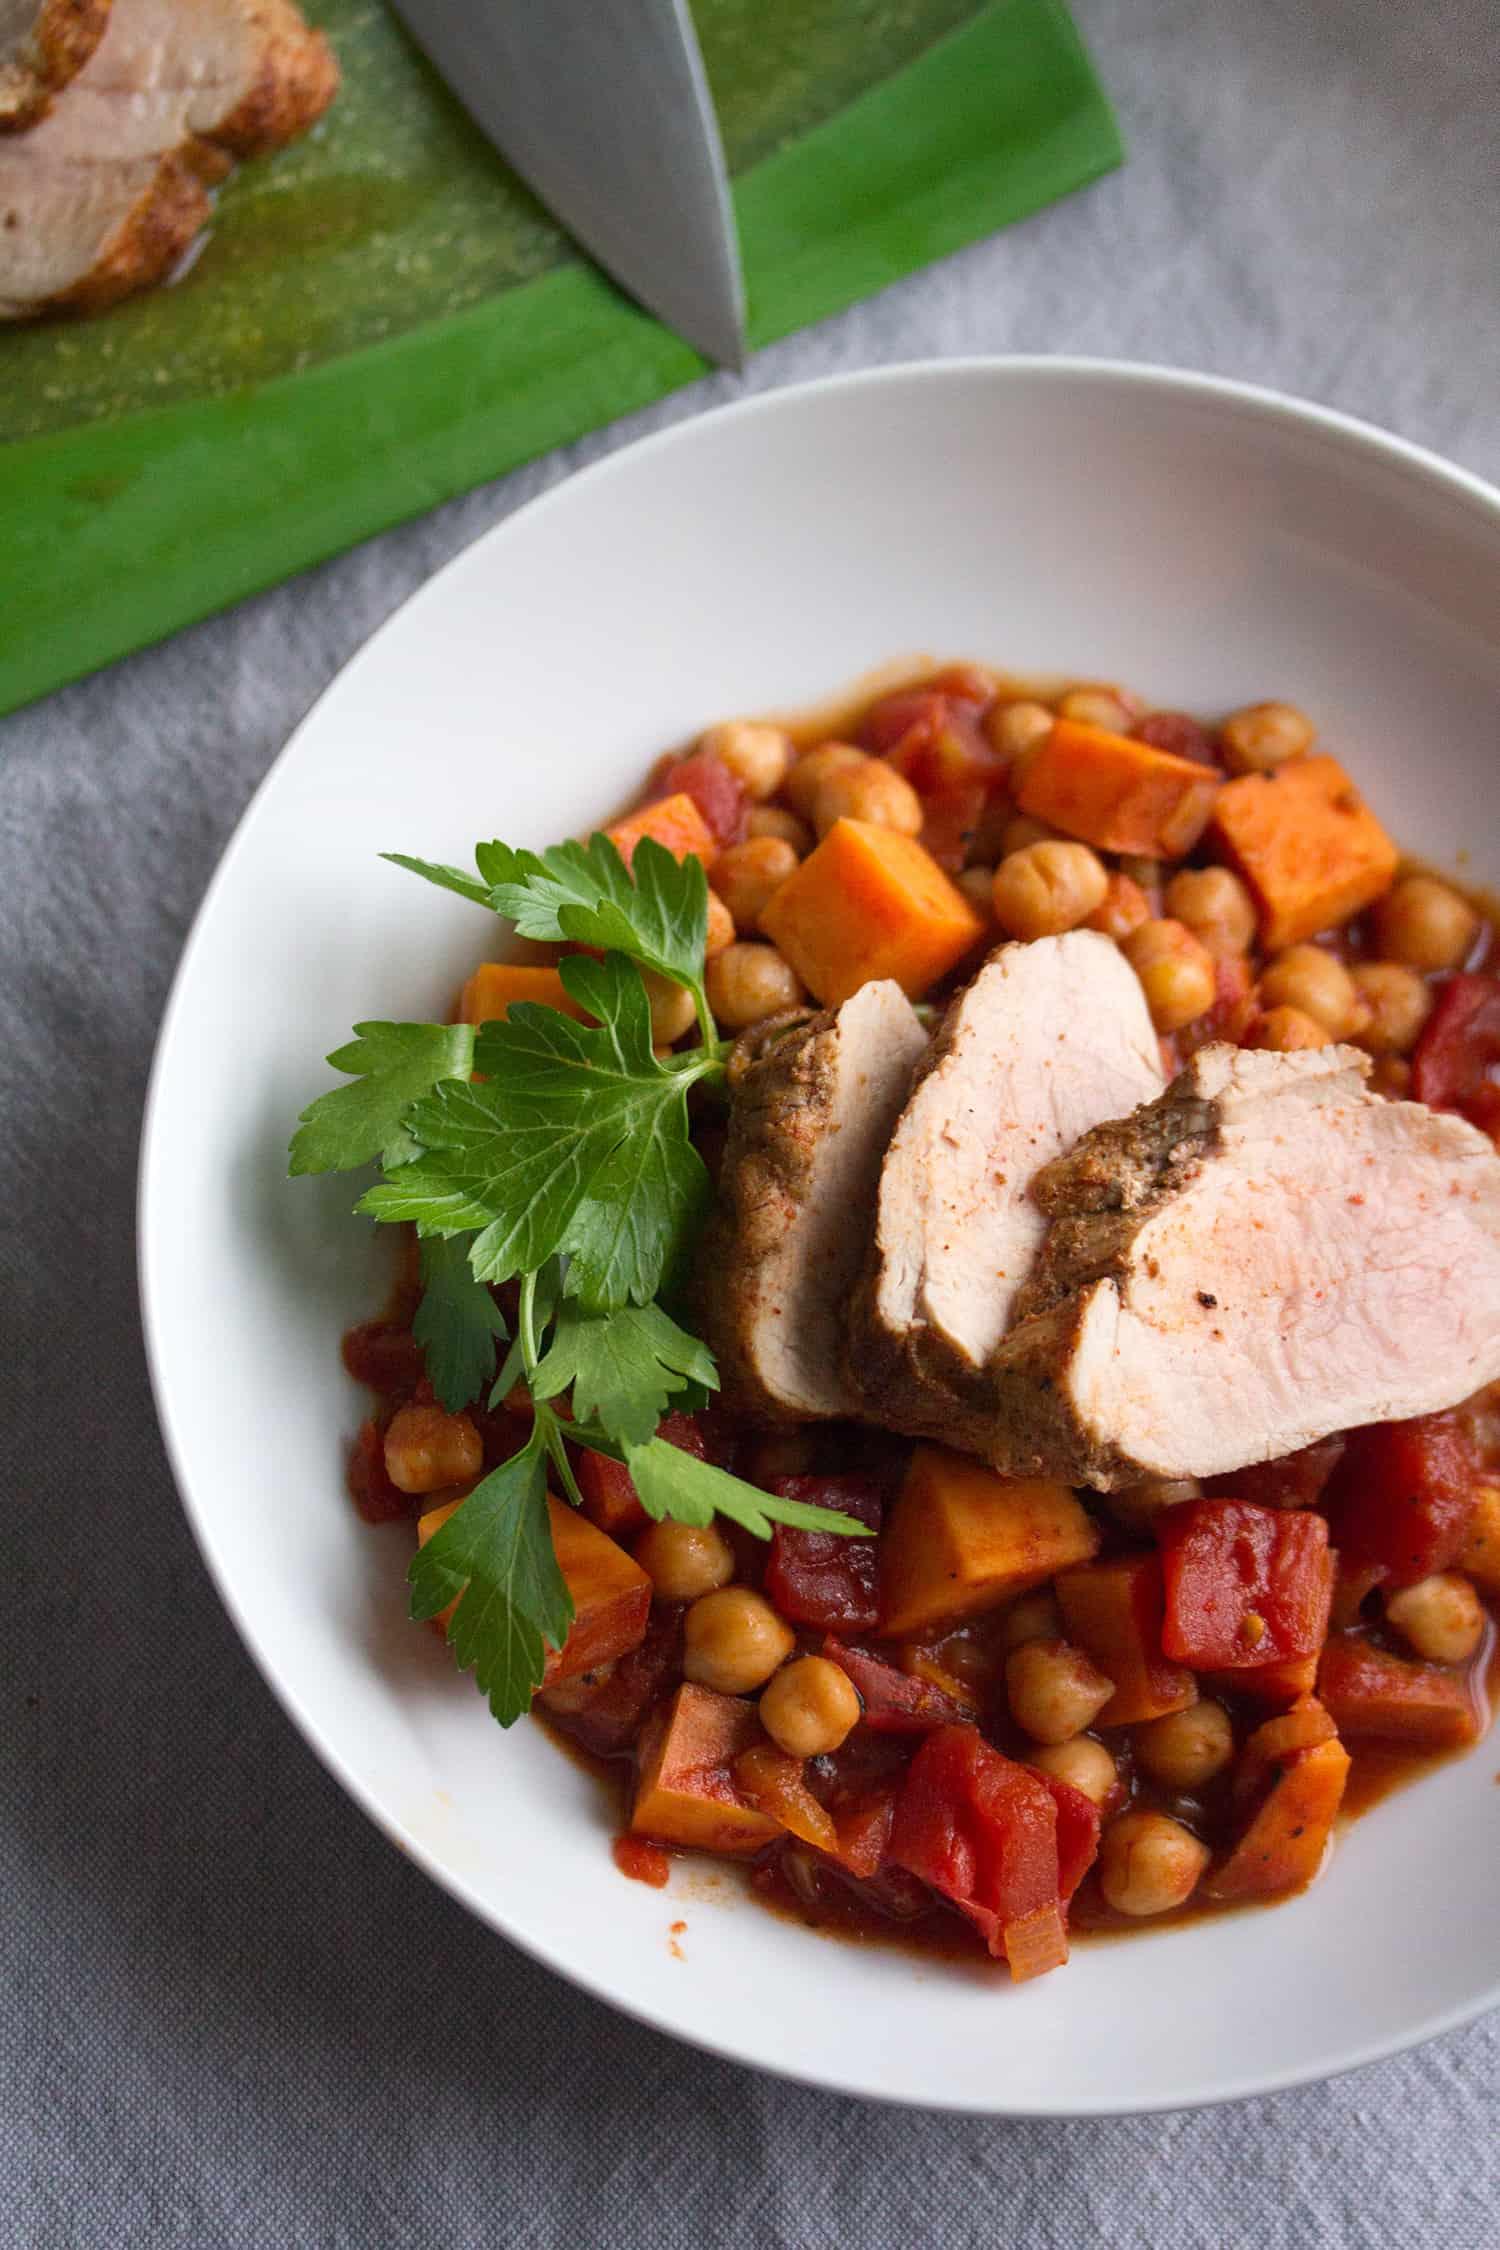 For Ariel: Roast Pork Tenderloin with Spicy Chickpea Stew